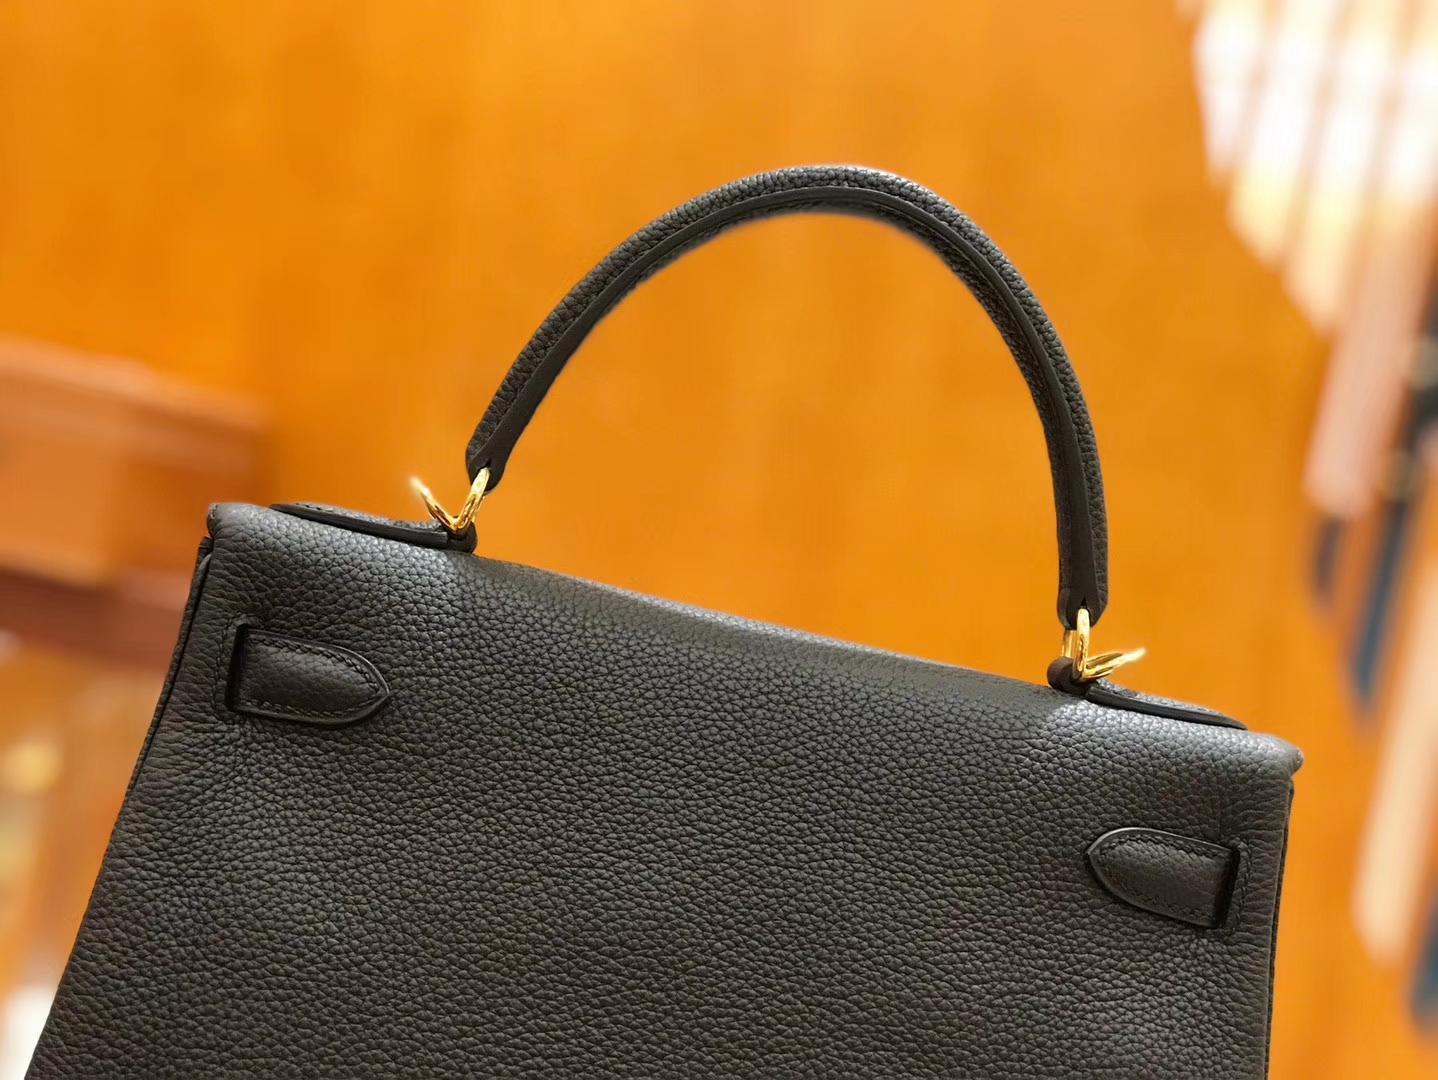 Hermès(爱马仕)Kelly 28cm togo 牛皮 经典黑 金扣 全手工缝制 现货